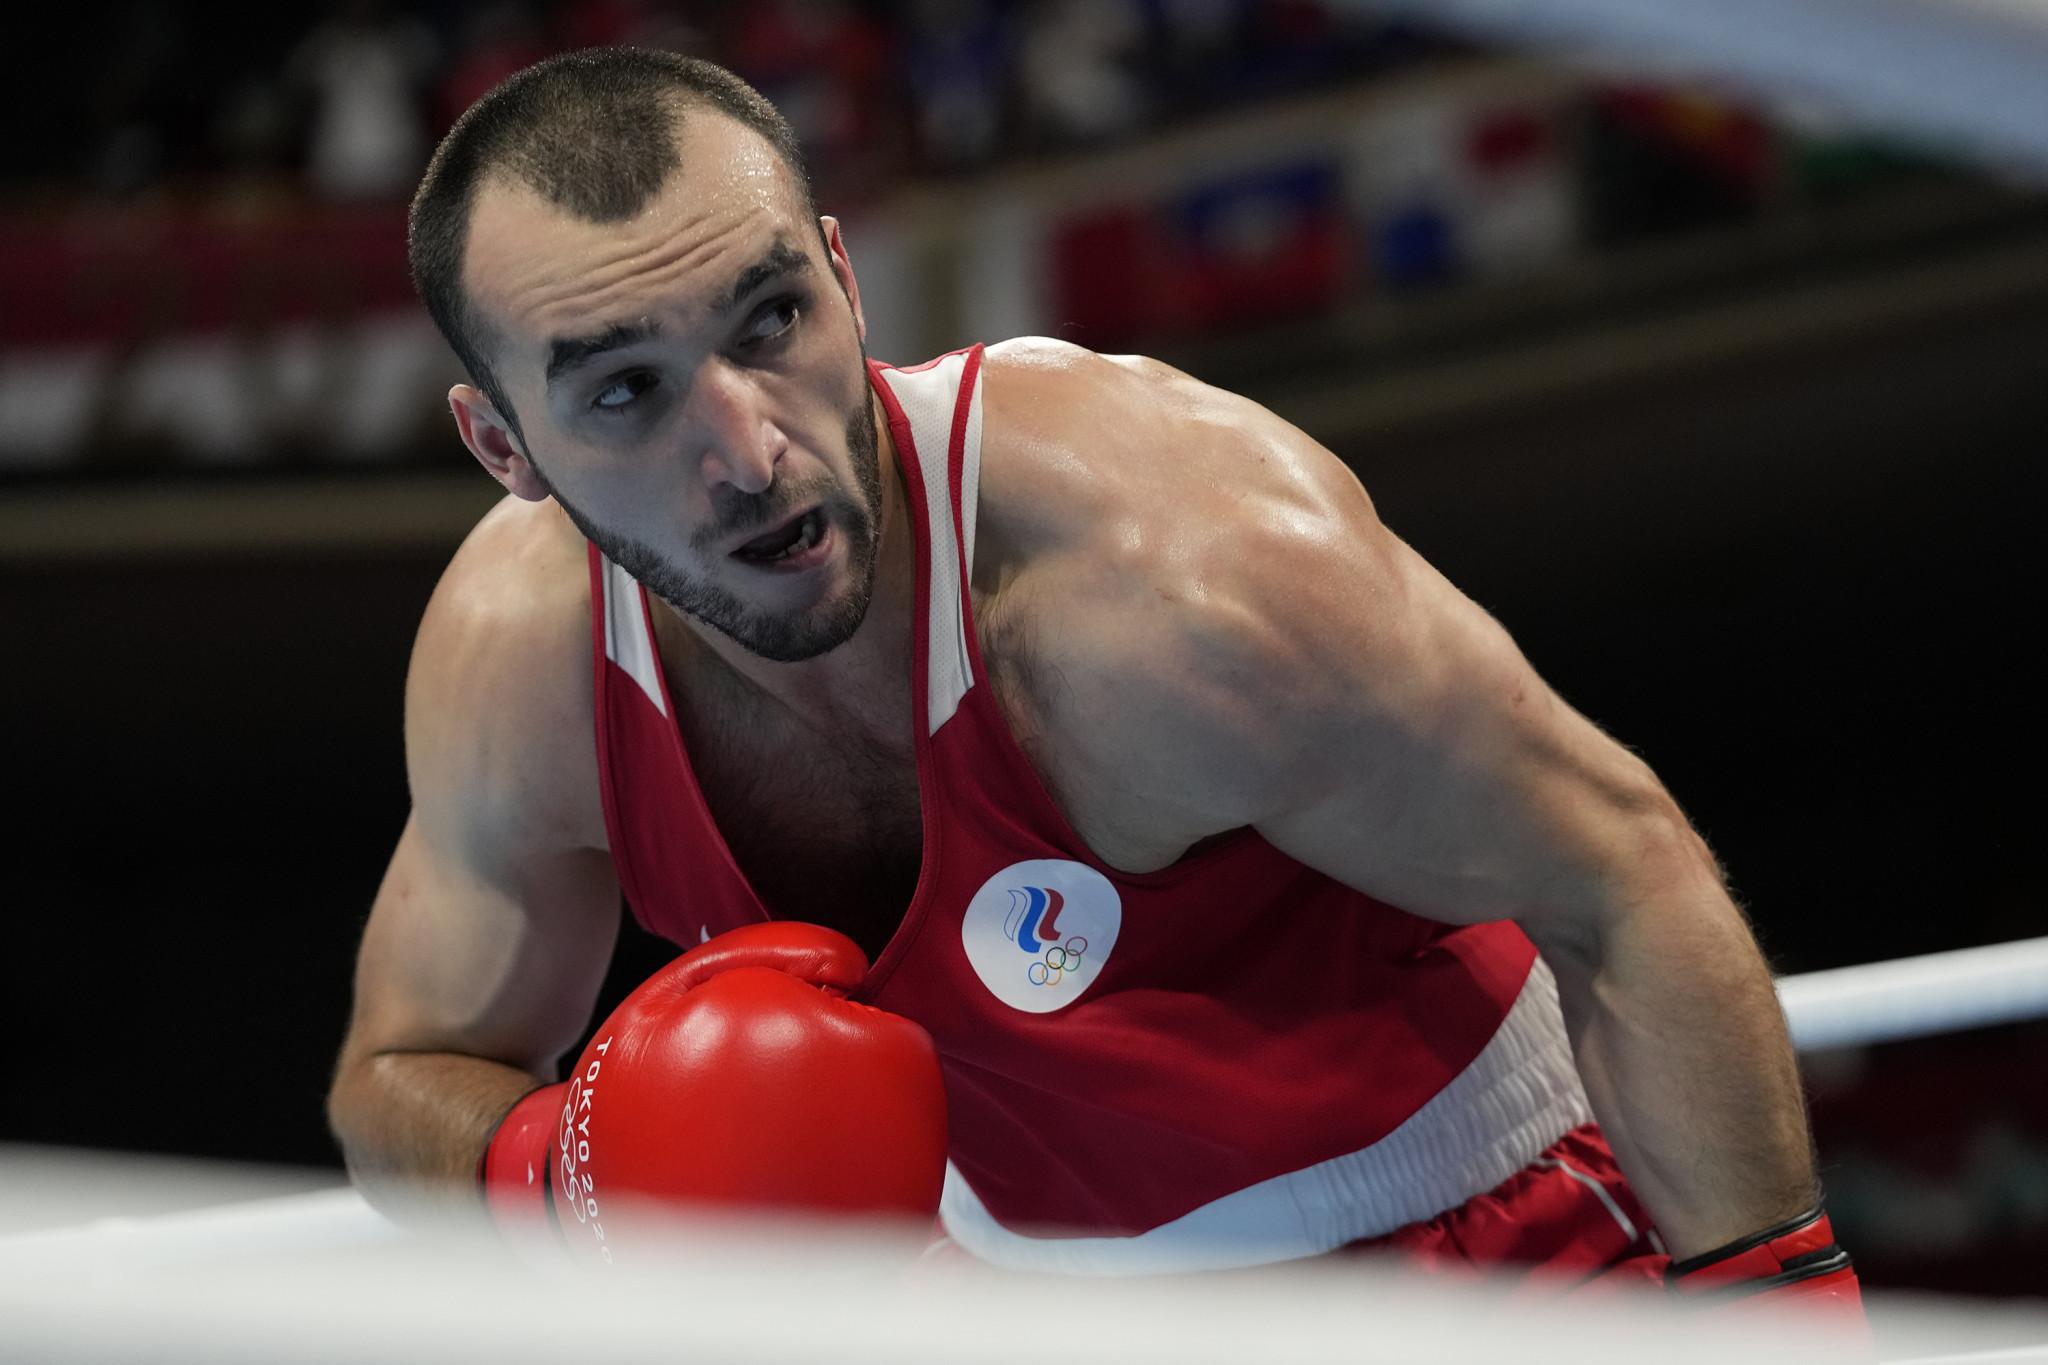 Tokyo 2020 runner-up Gadzhimagomedov sets sights on Paris 2024 gold